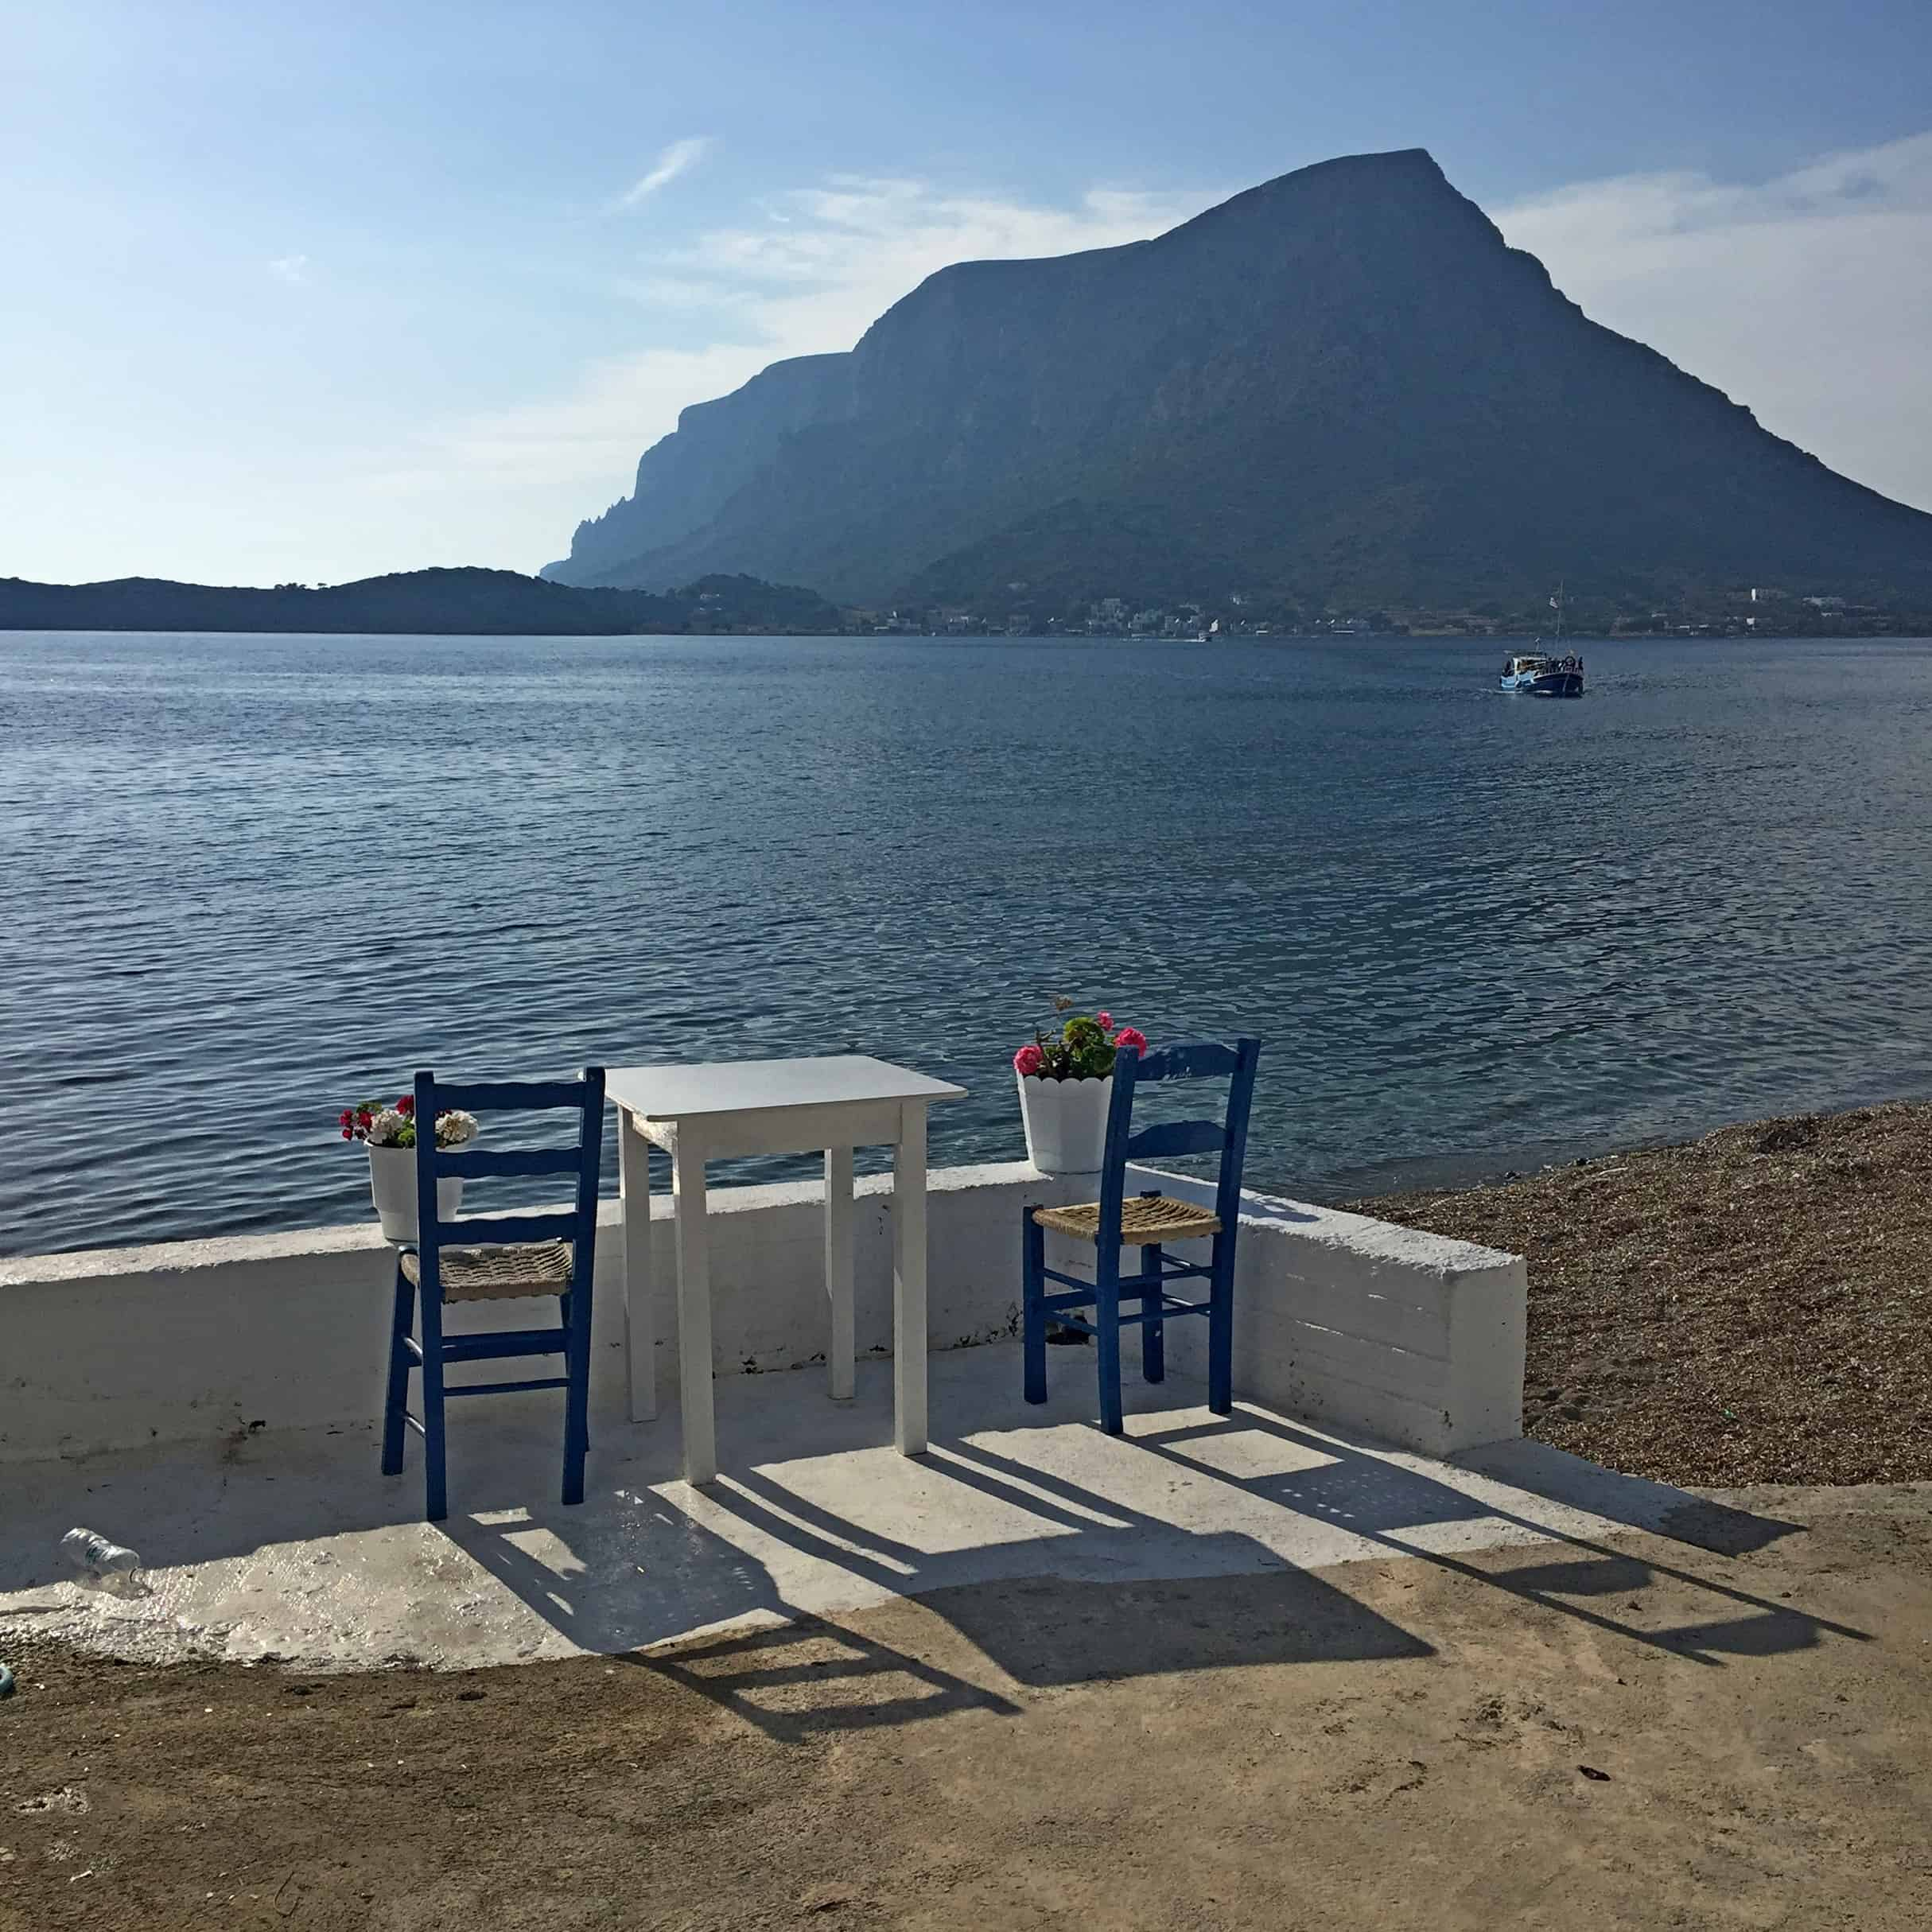 Grieks tafereeltje op Kalymnos